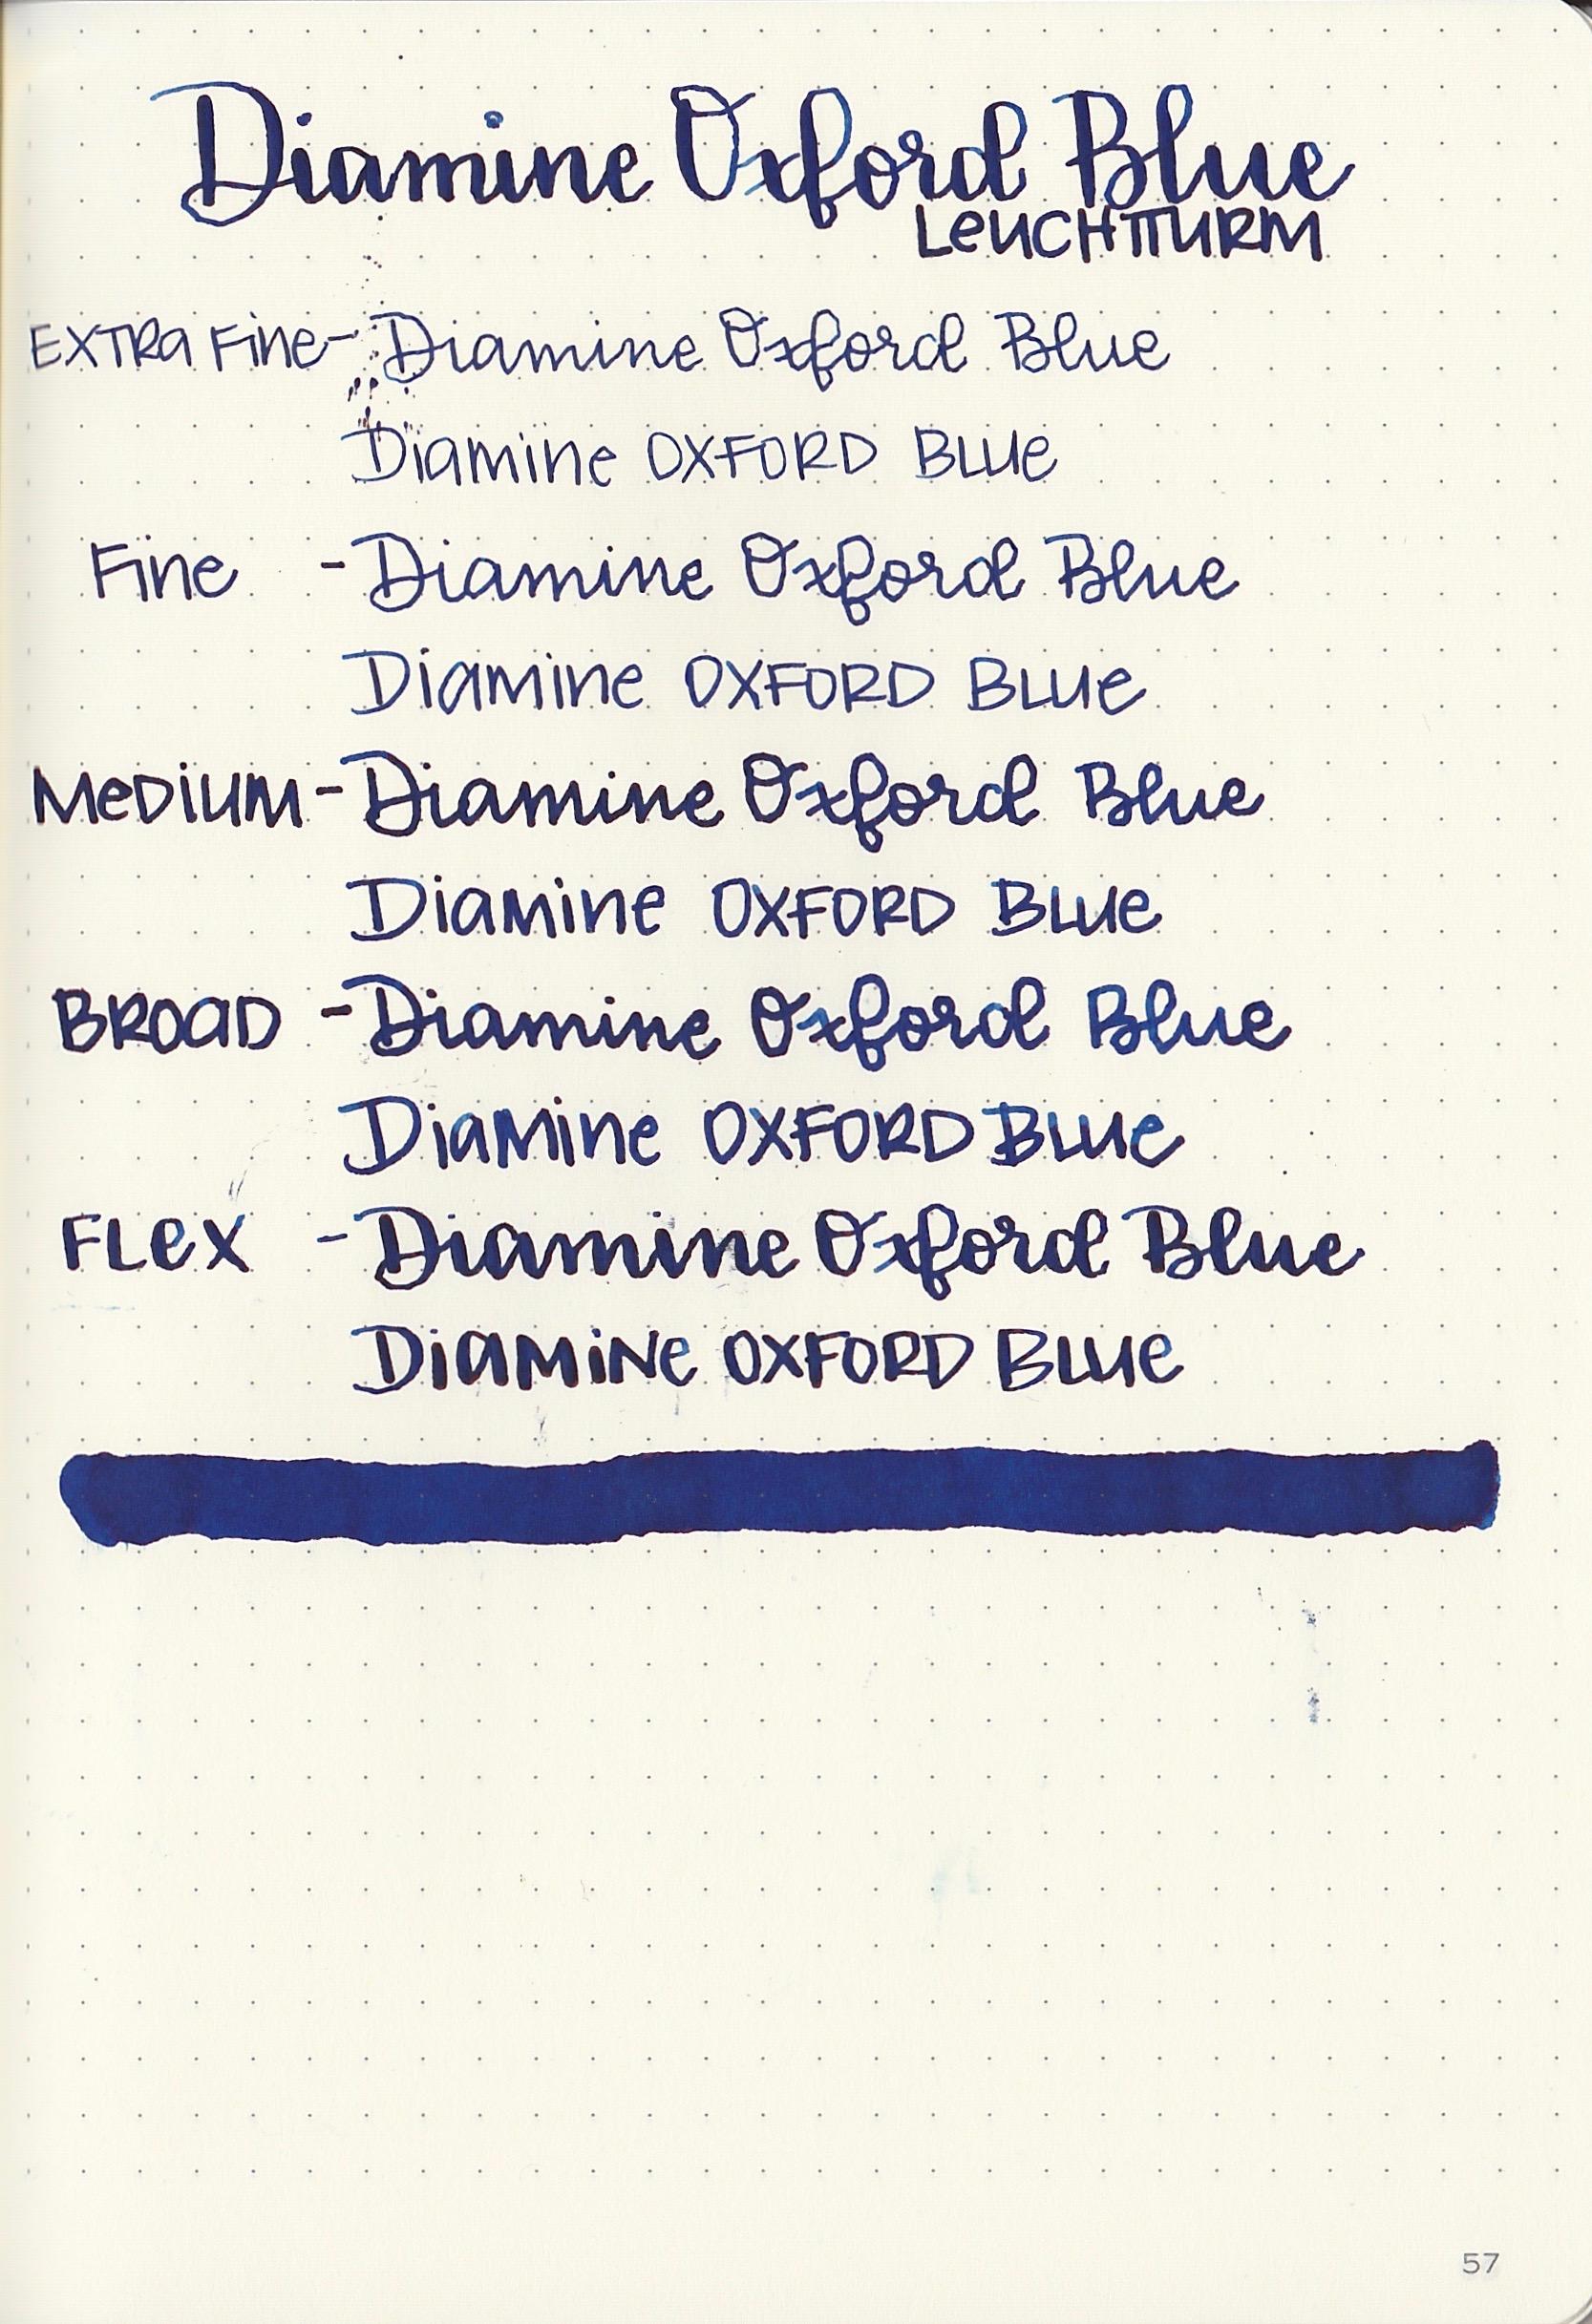 DOxfordBlue - 9.jpg